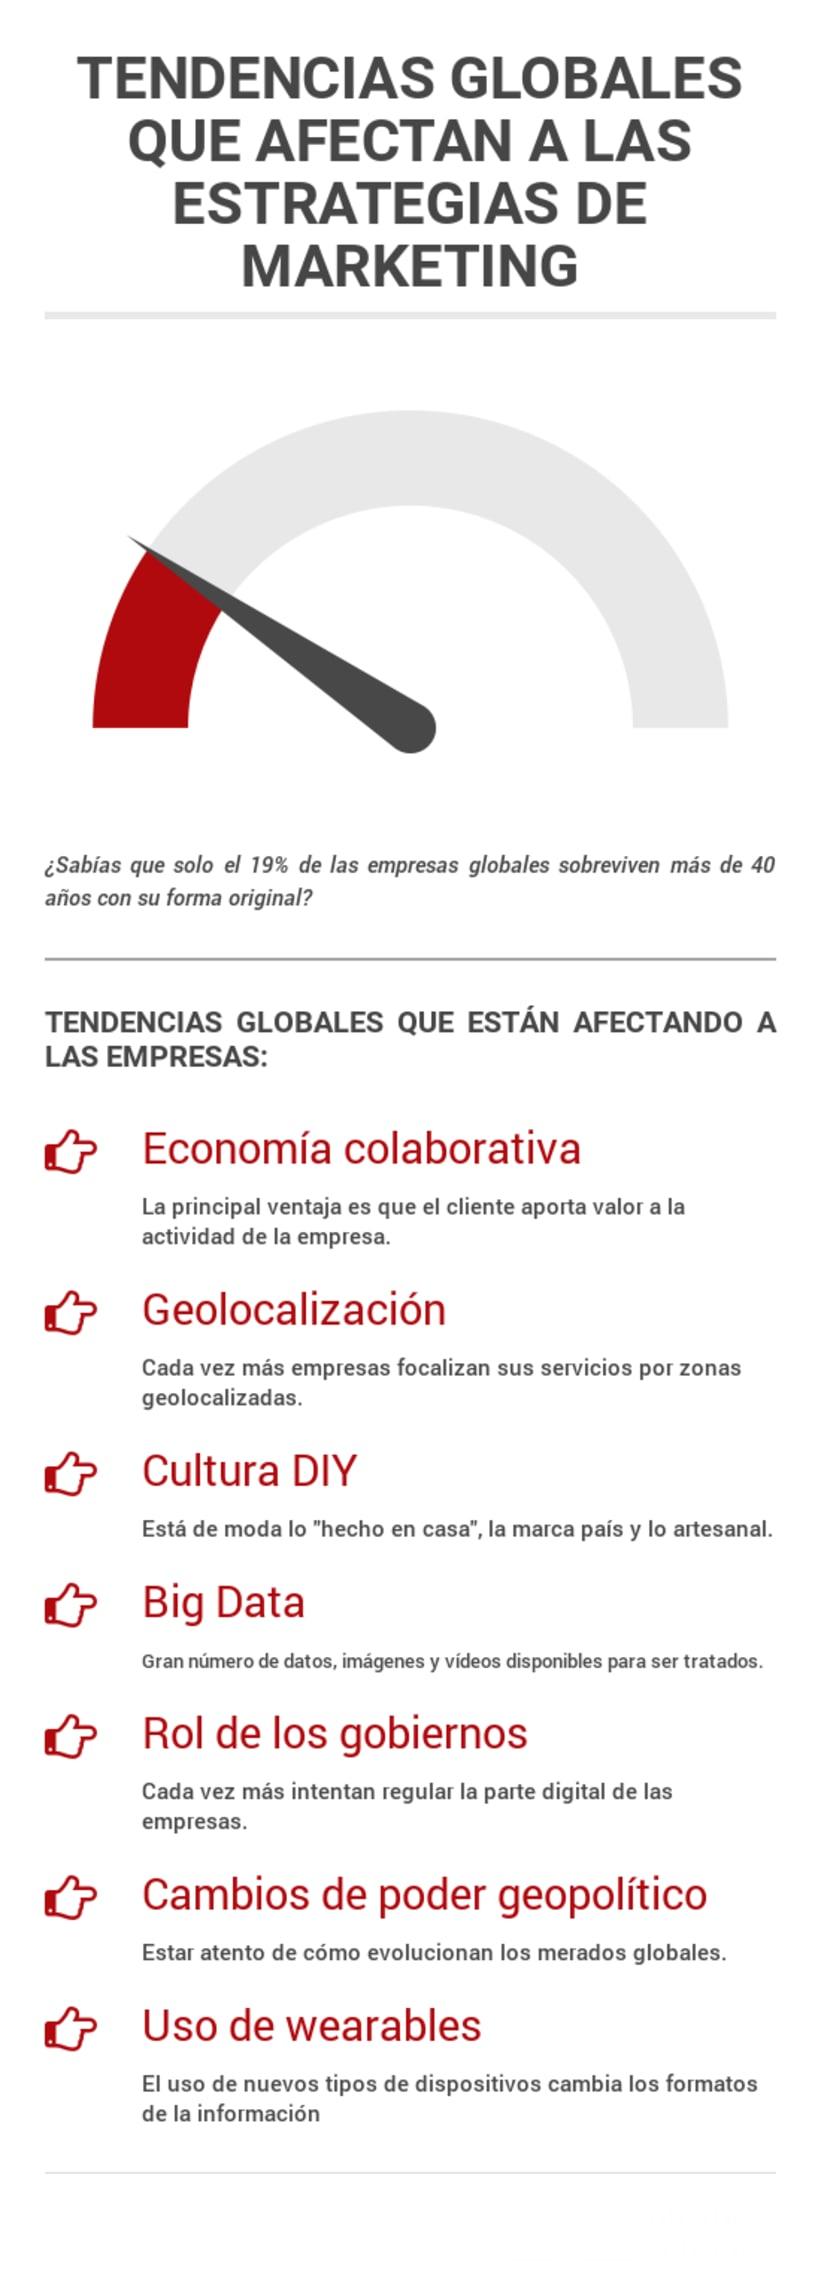 Tendencias Globales que afectan a las empresas -1